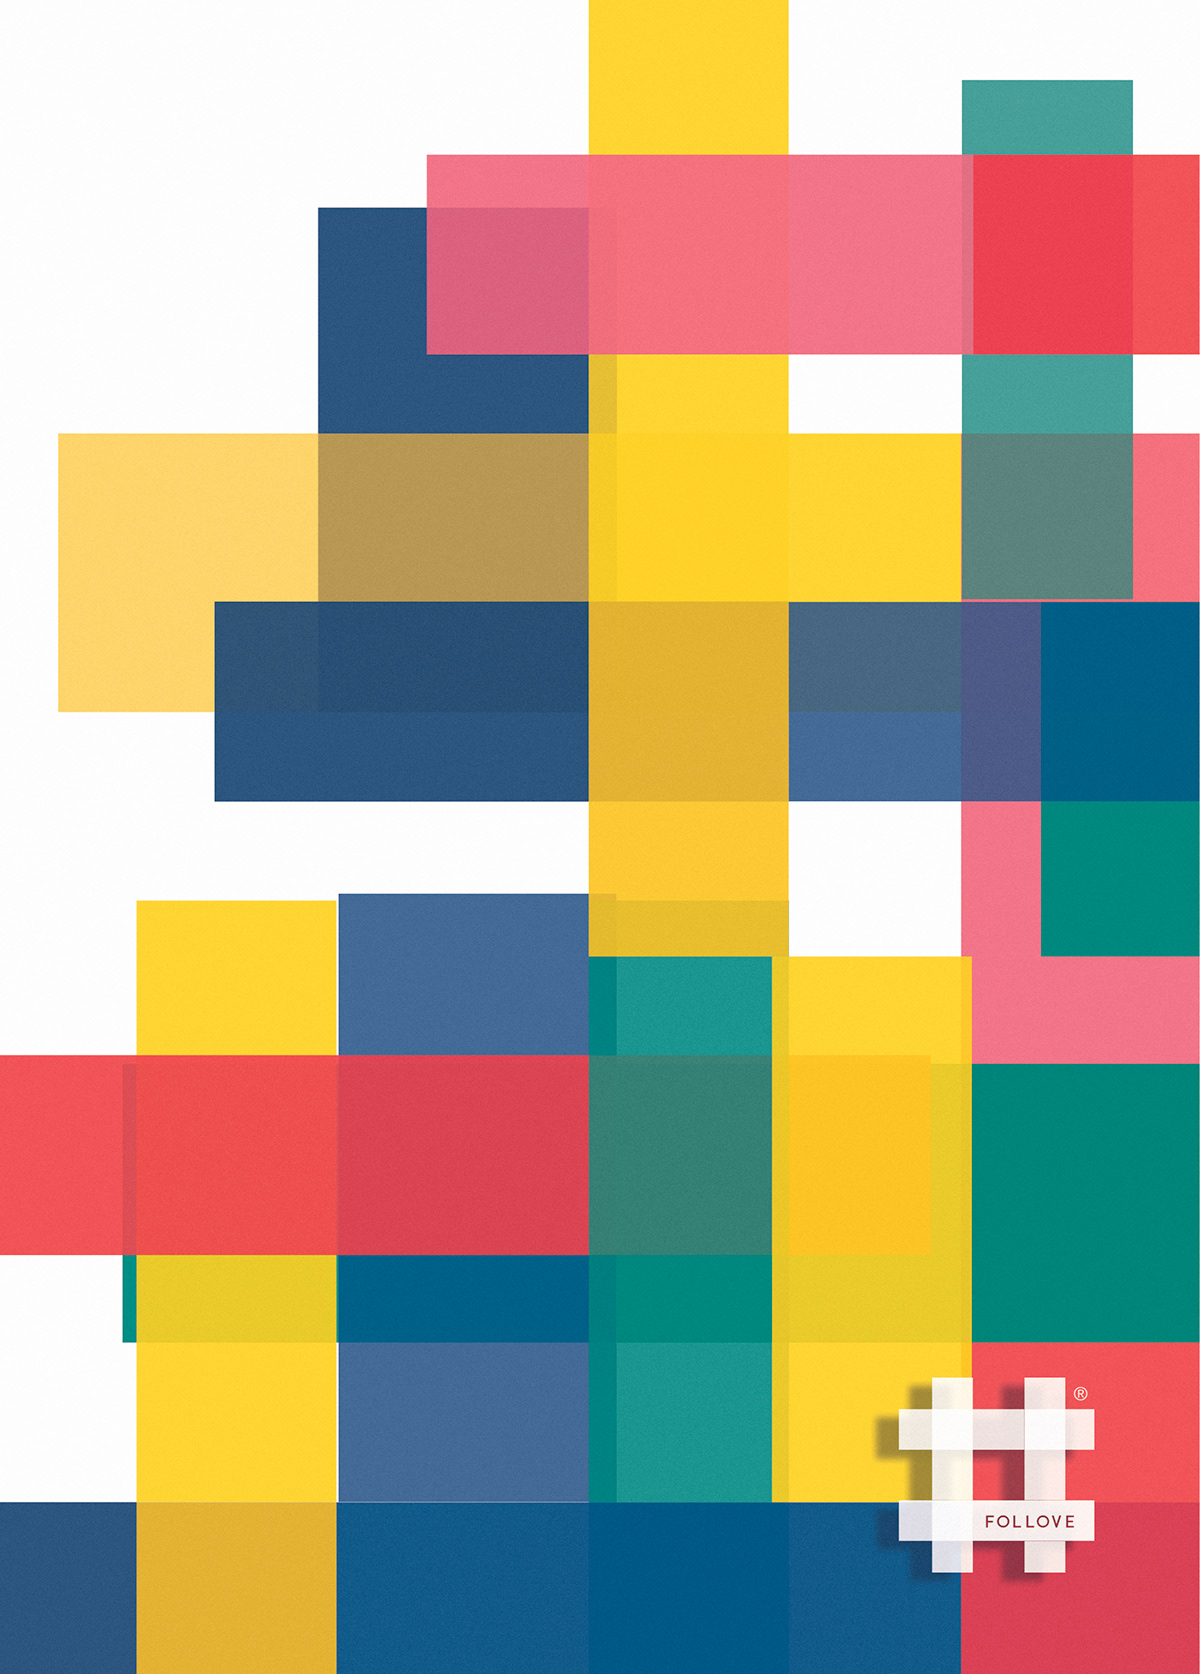 logo branding  corporate graphicdesign Startup adobe ADOBEportfolio